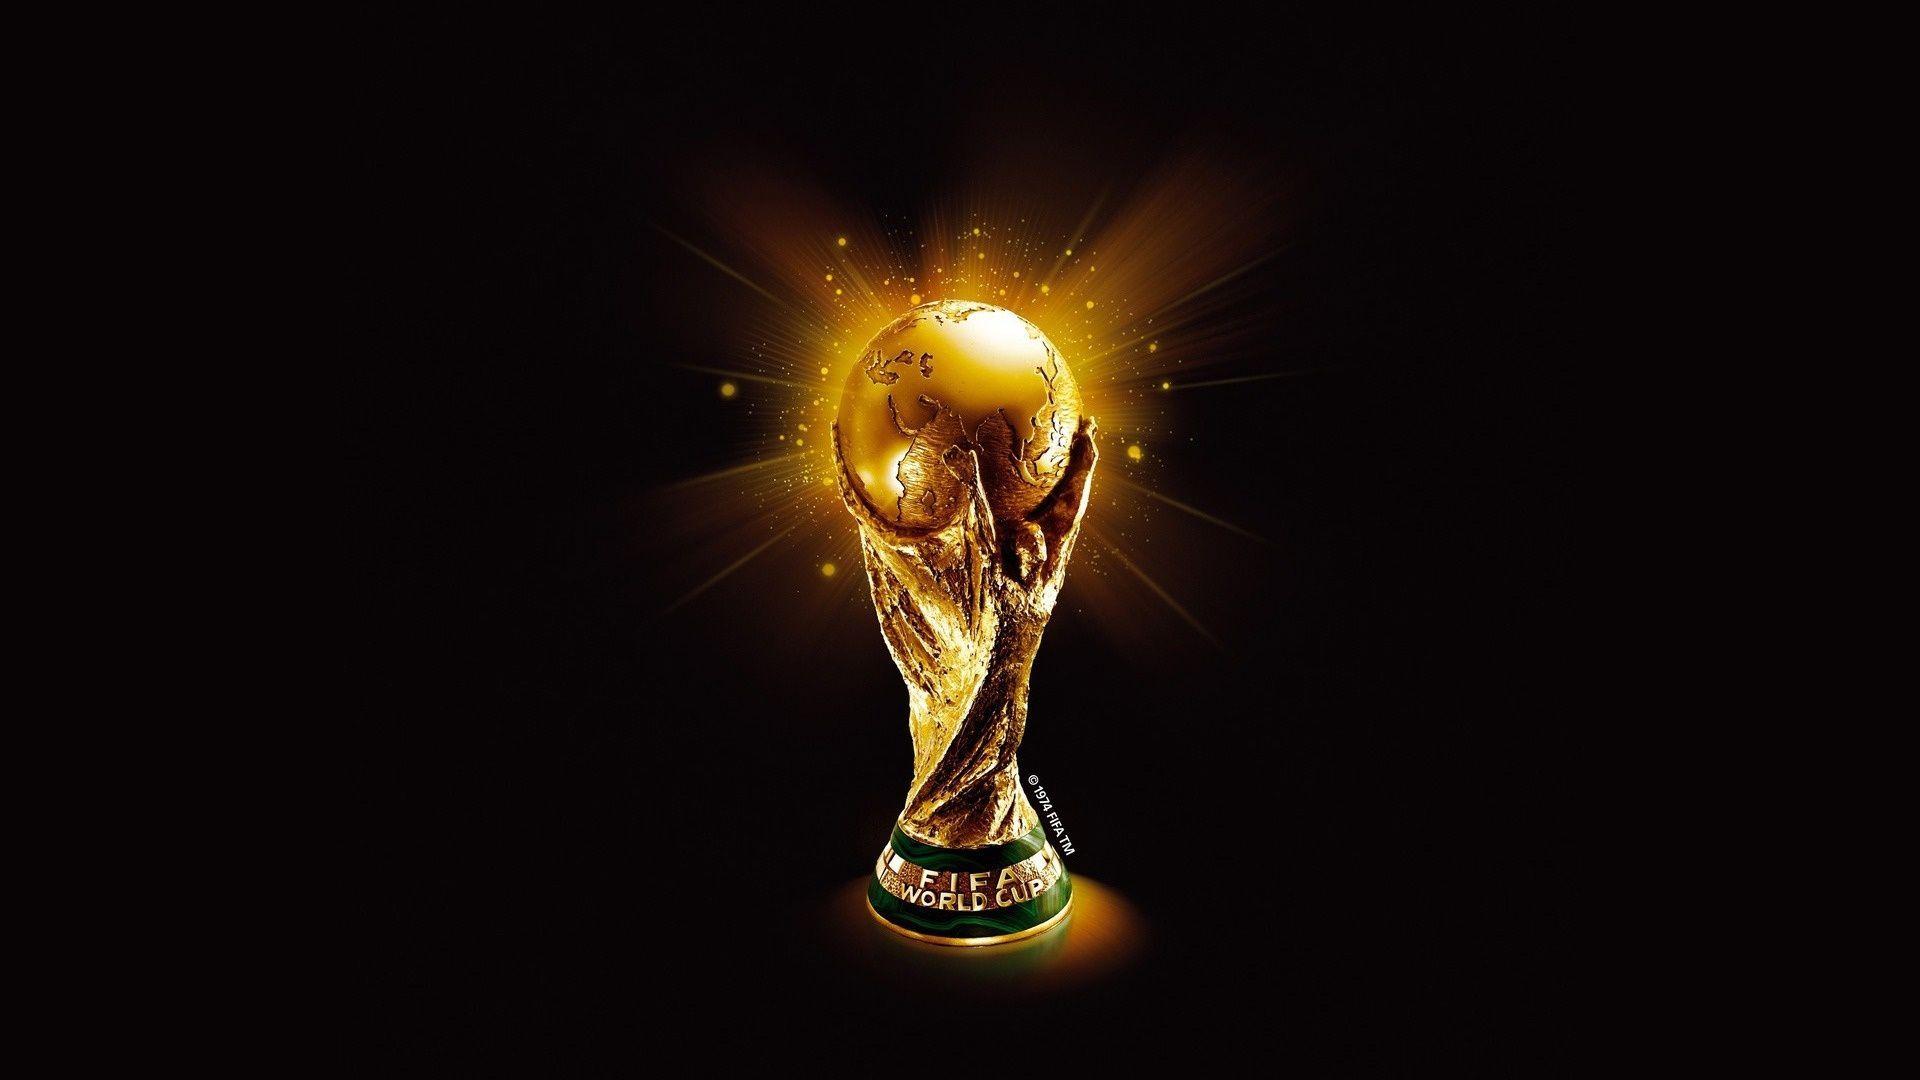 Golden-Cup.jpg (1920×1080)